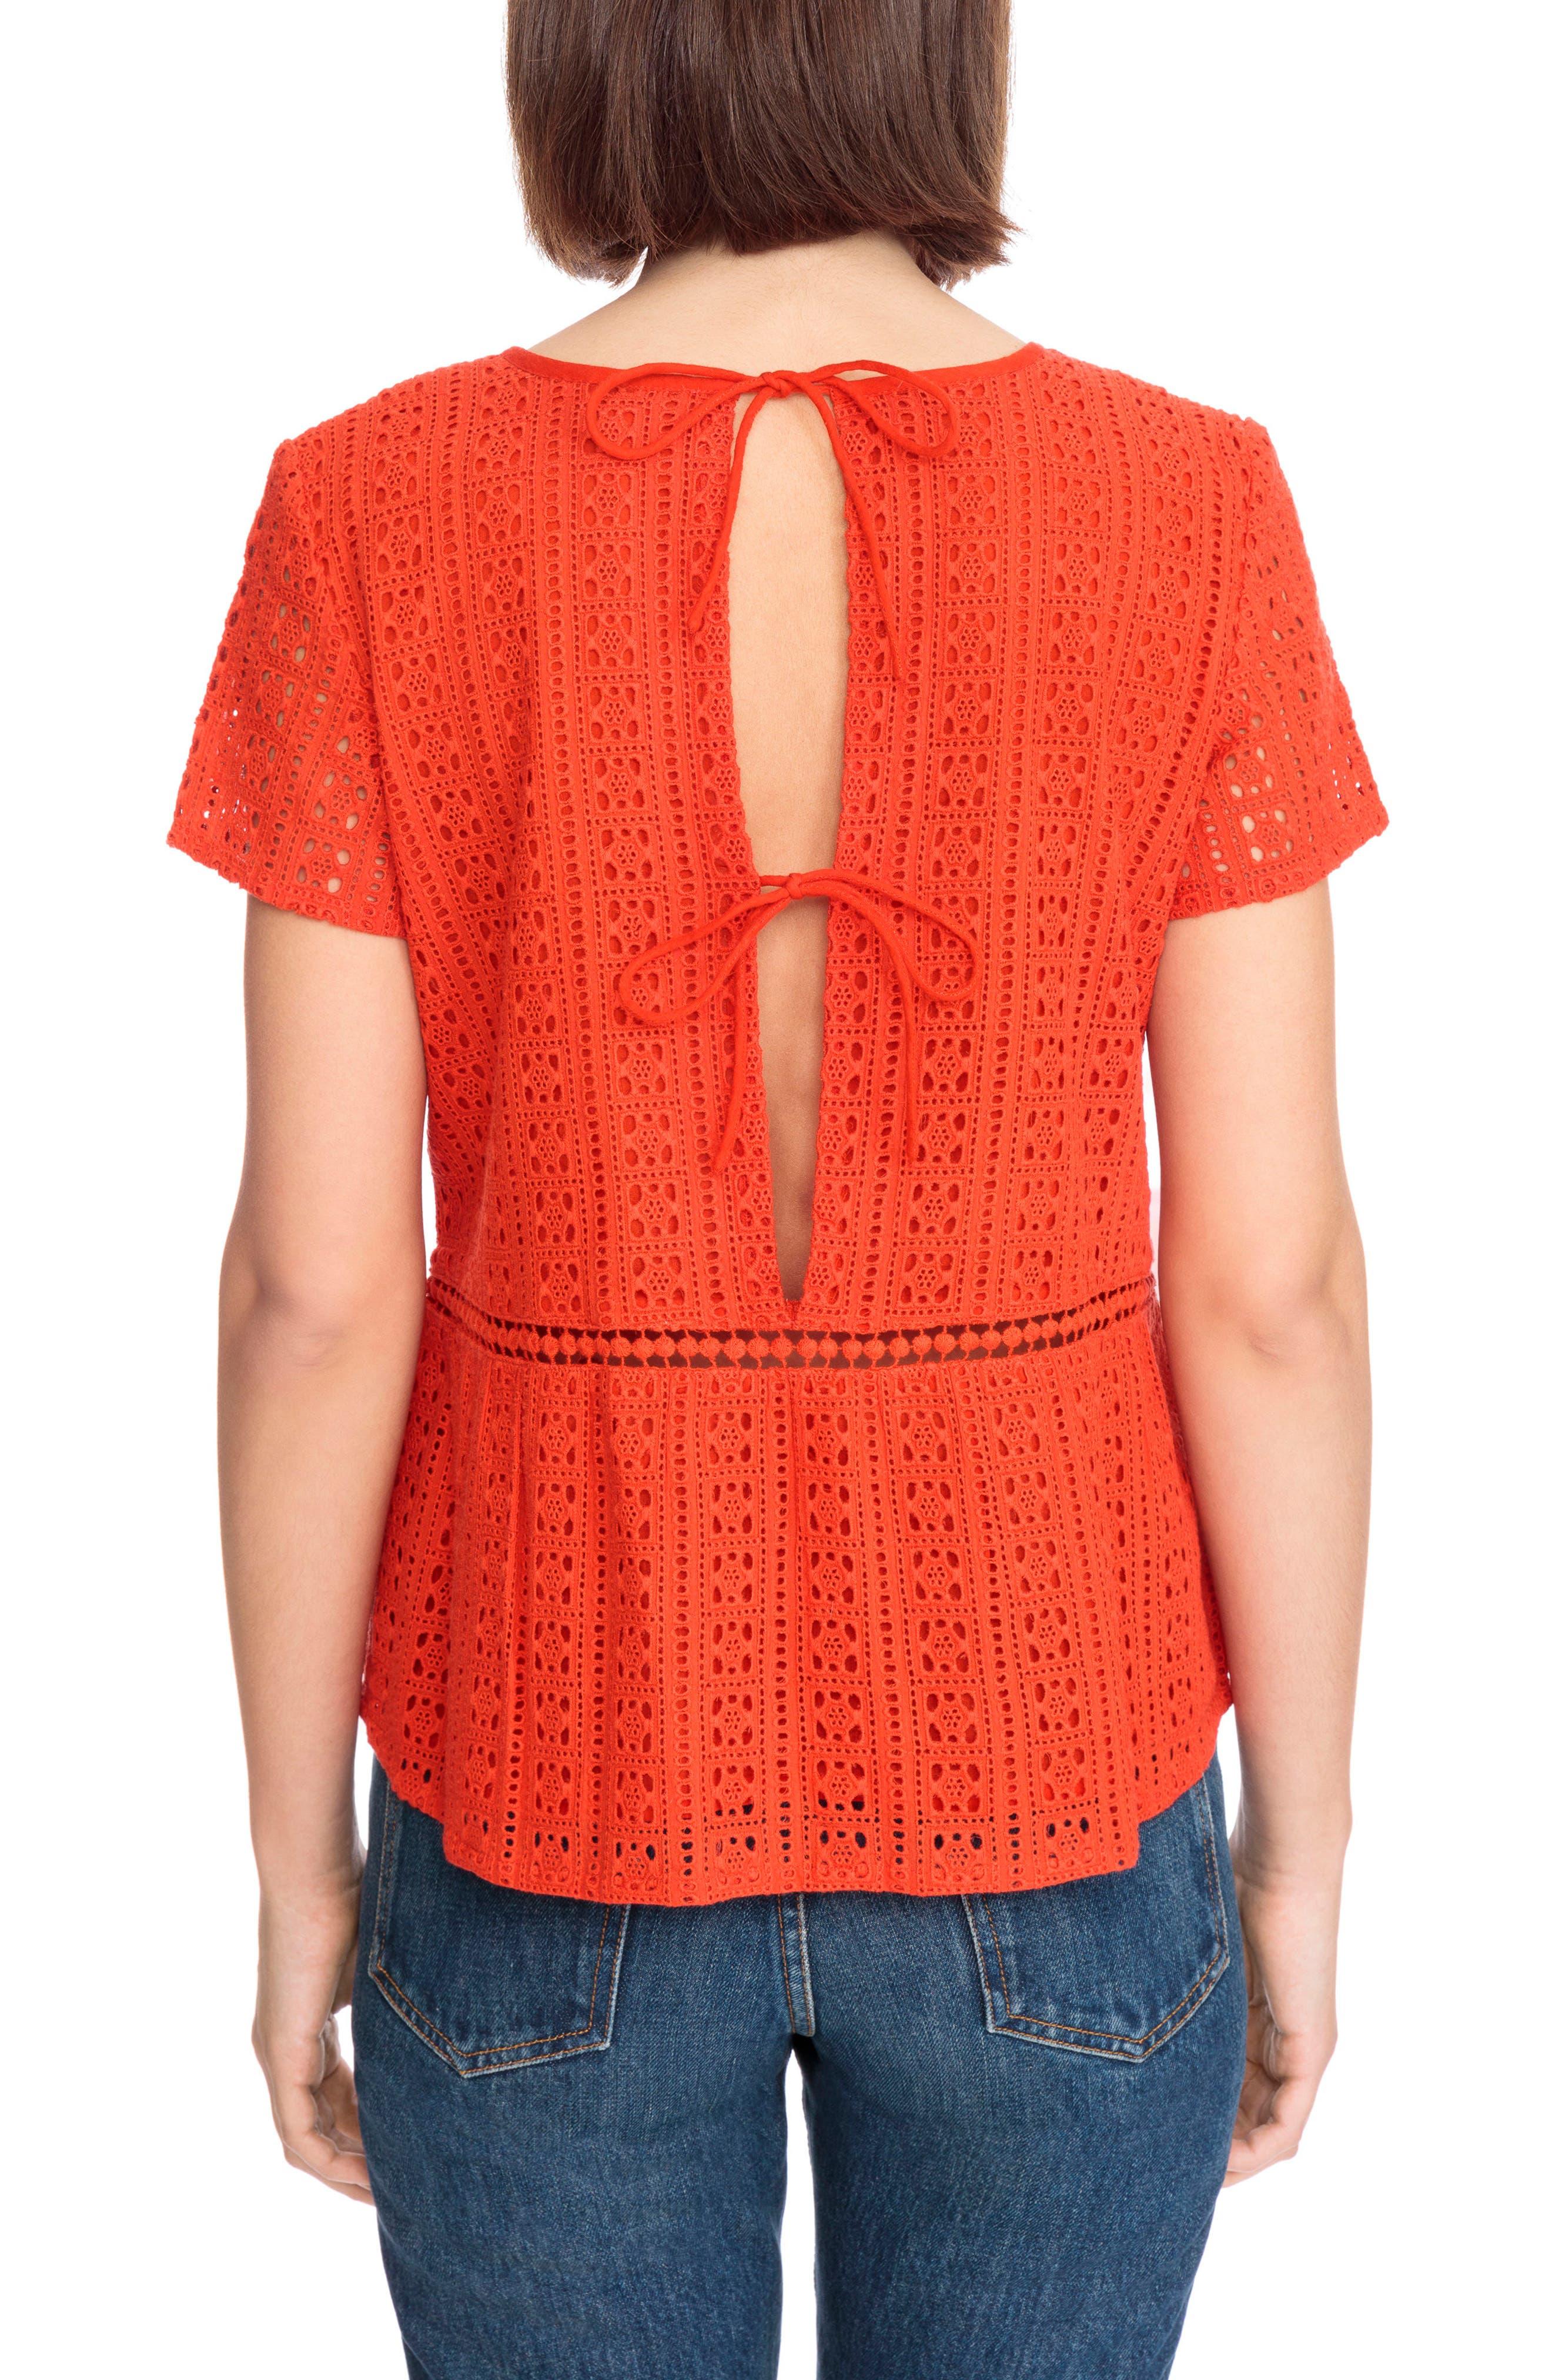 Clo Crochet Blouse,                             Alternate thumbnail 4, color,